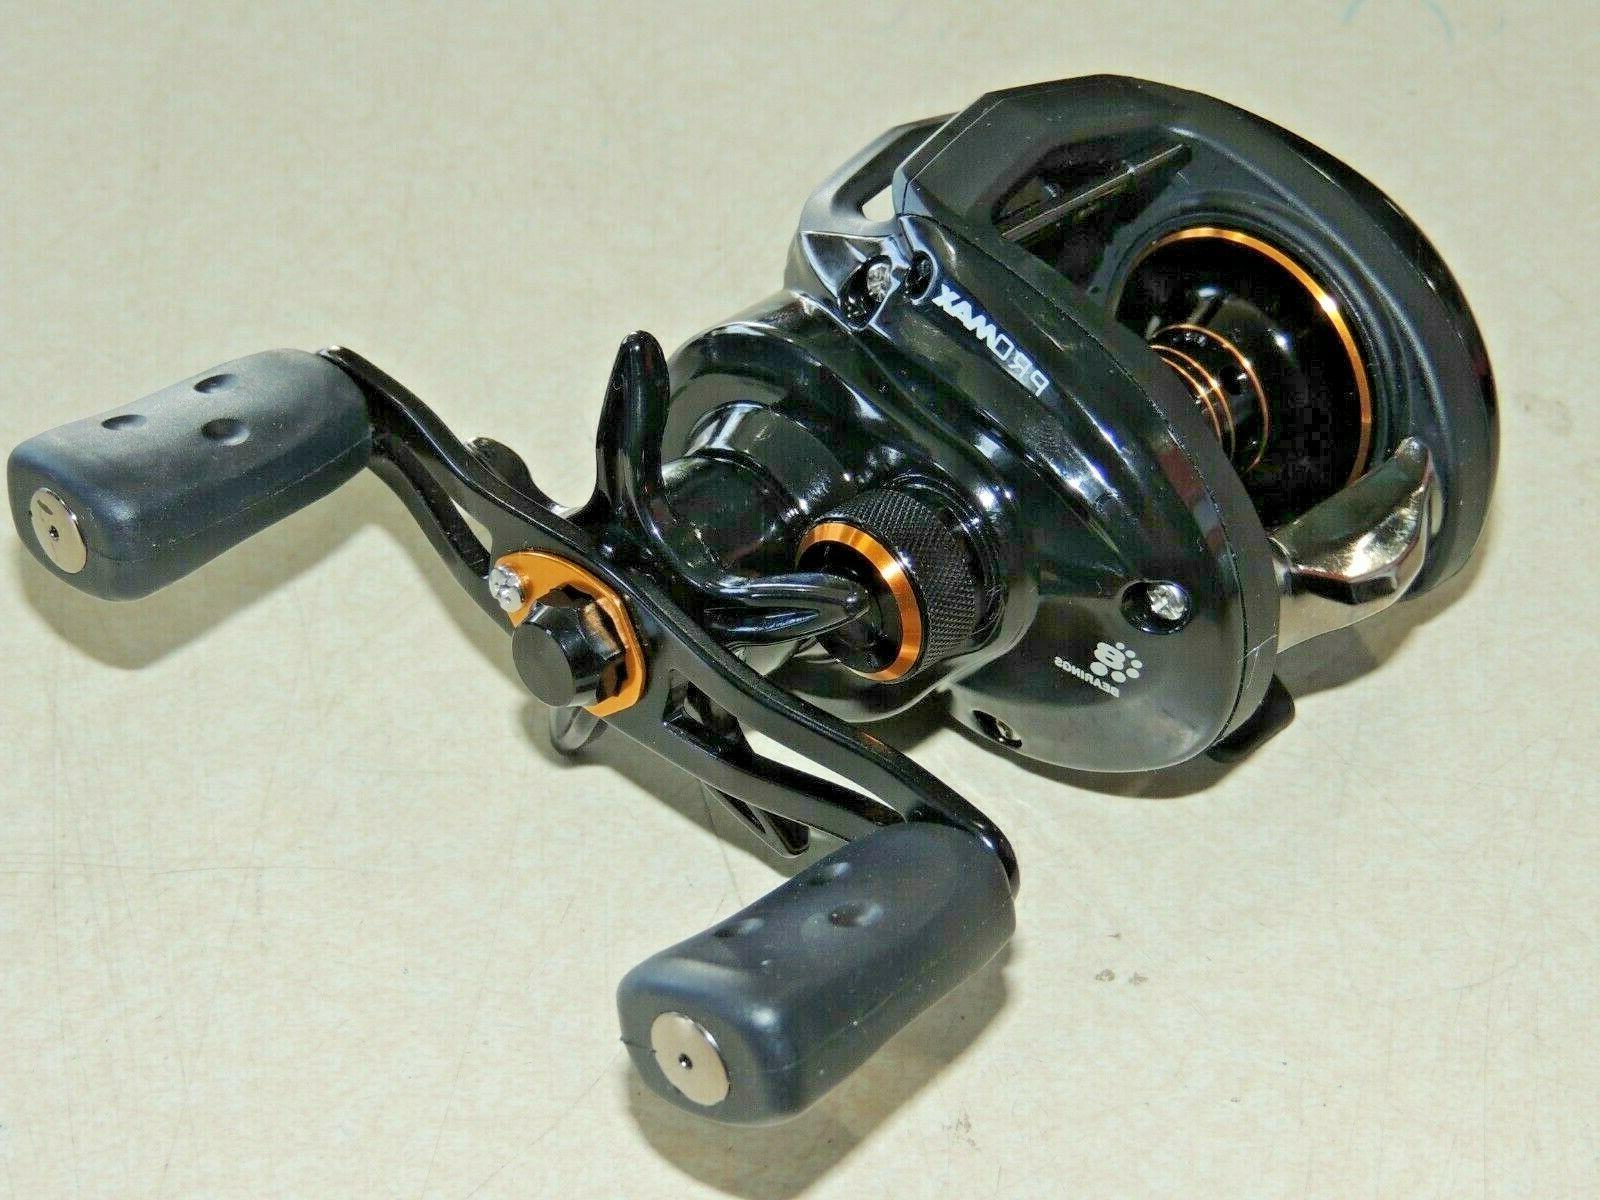 pmax3 pro max baitcast fishing reel 7